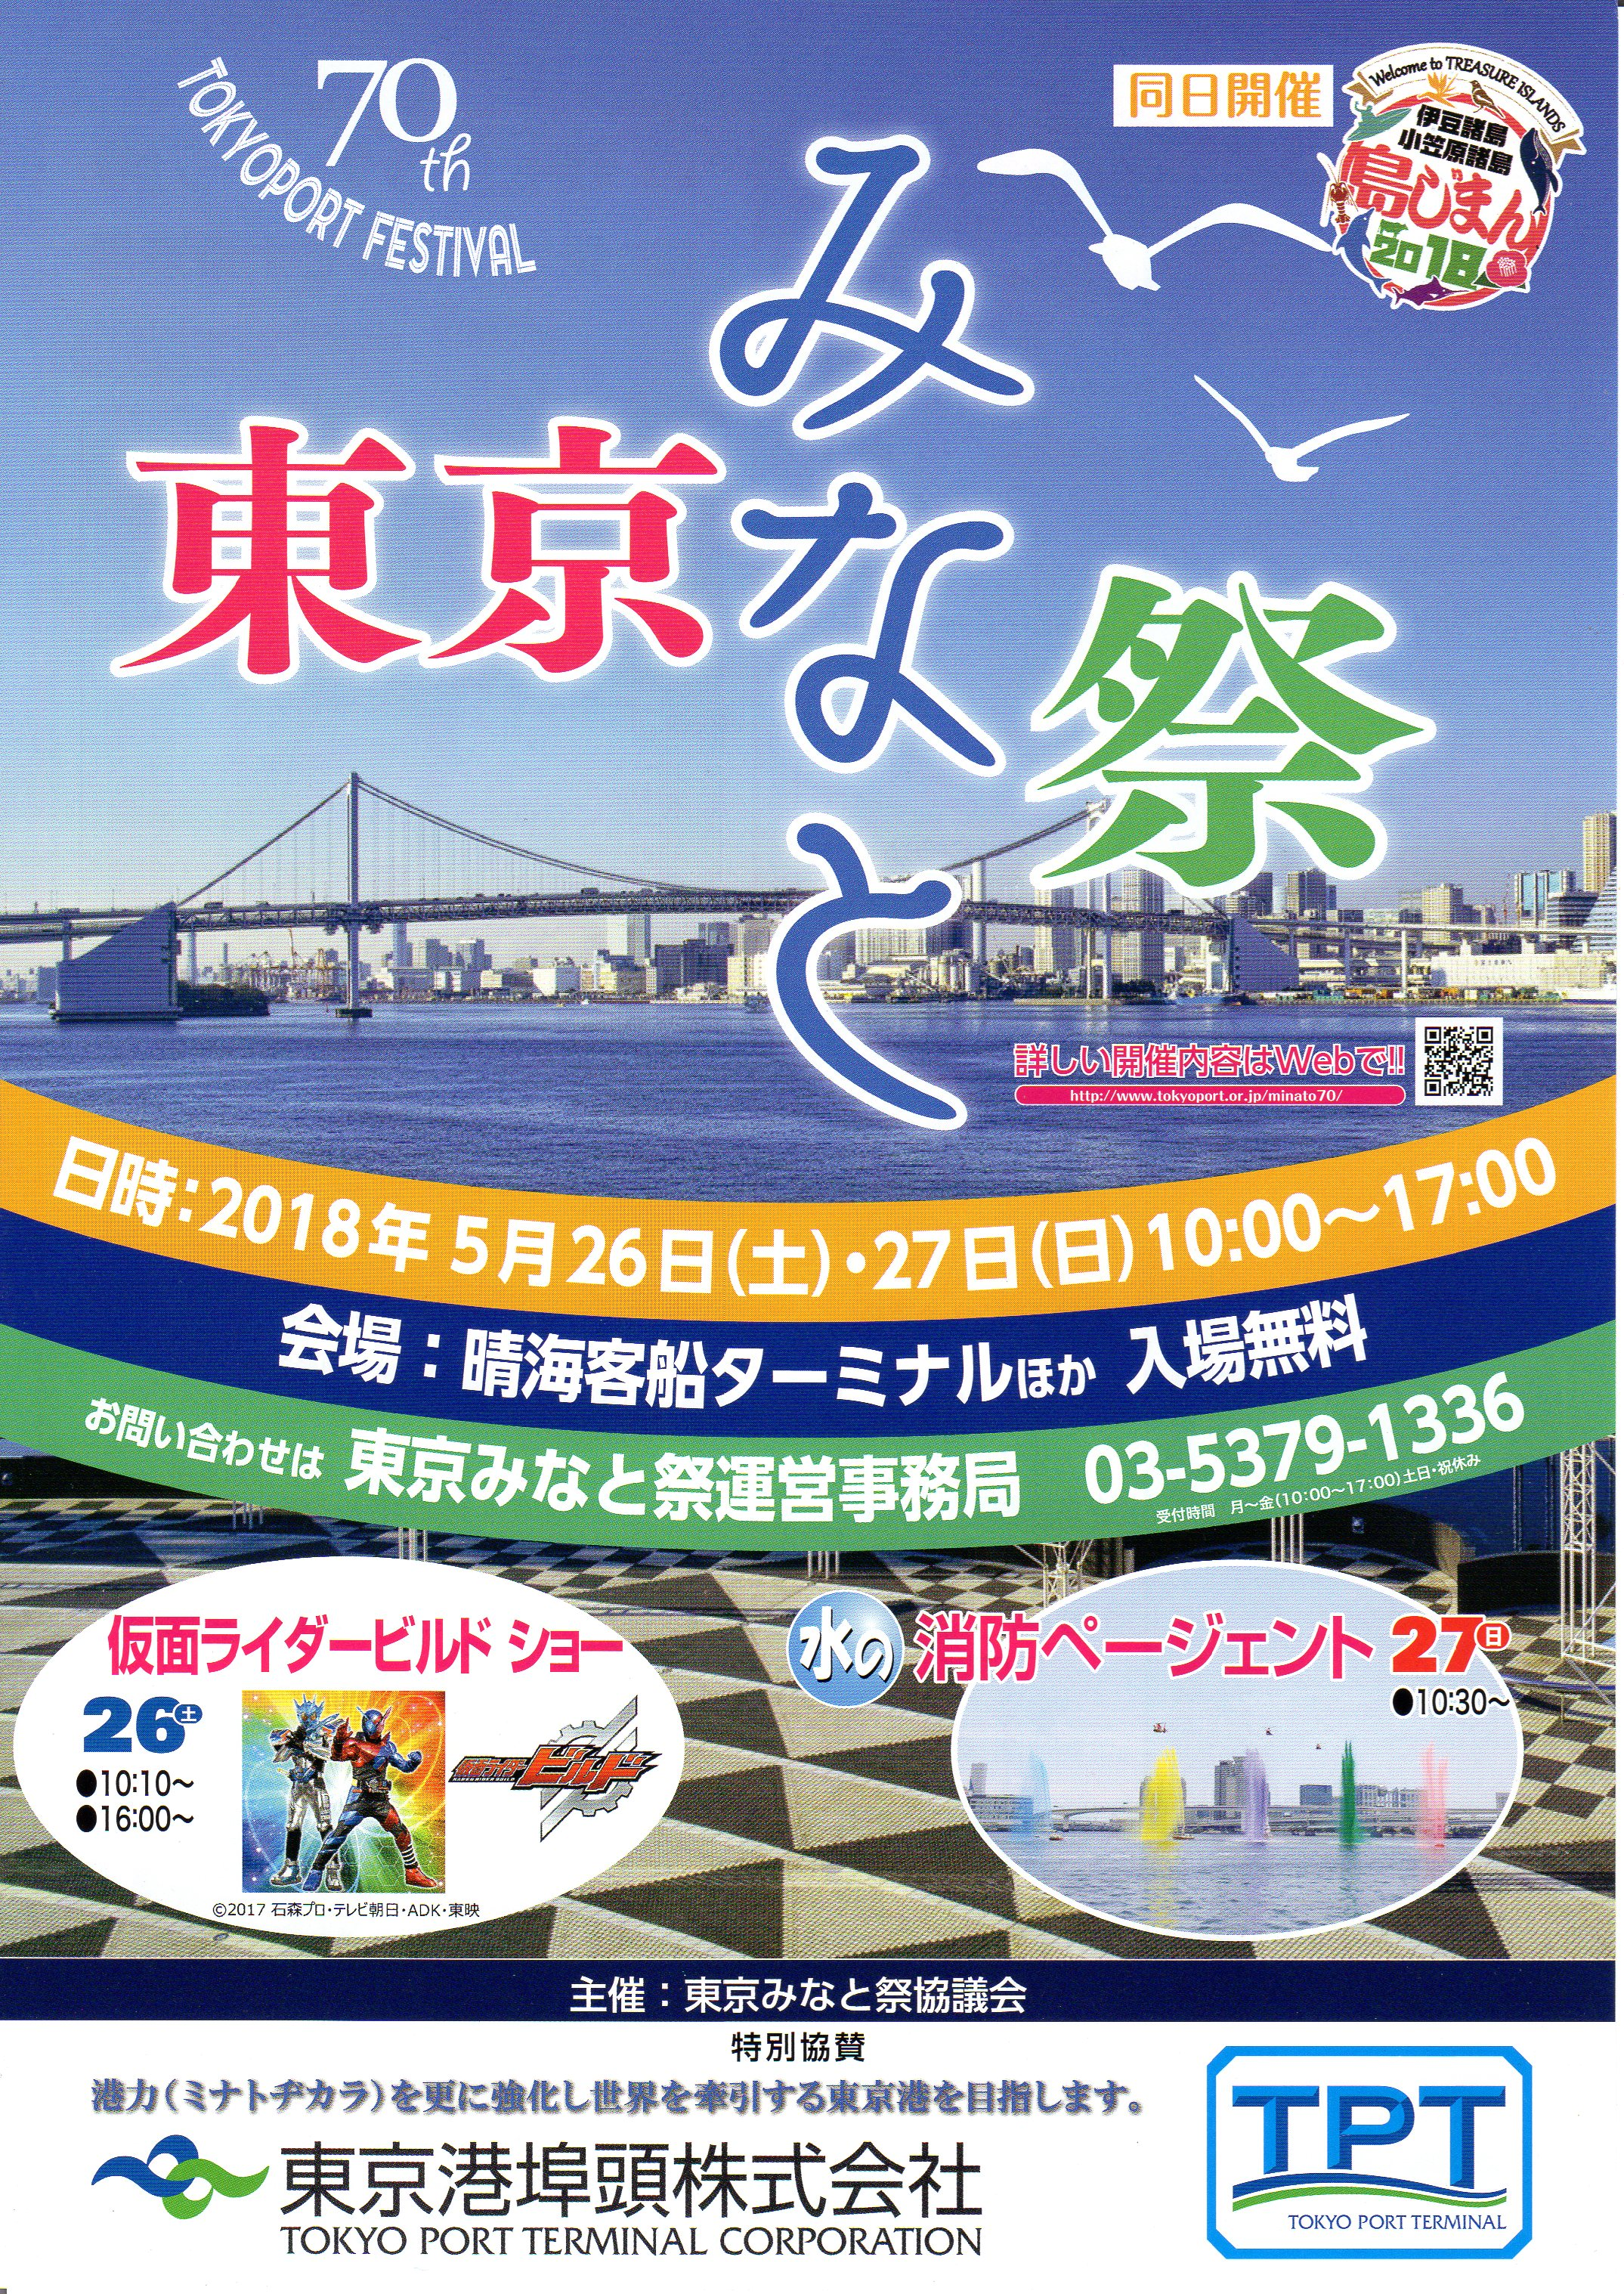 http://unoyuko.com/blog/chanson/minatomatsuri.jpg